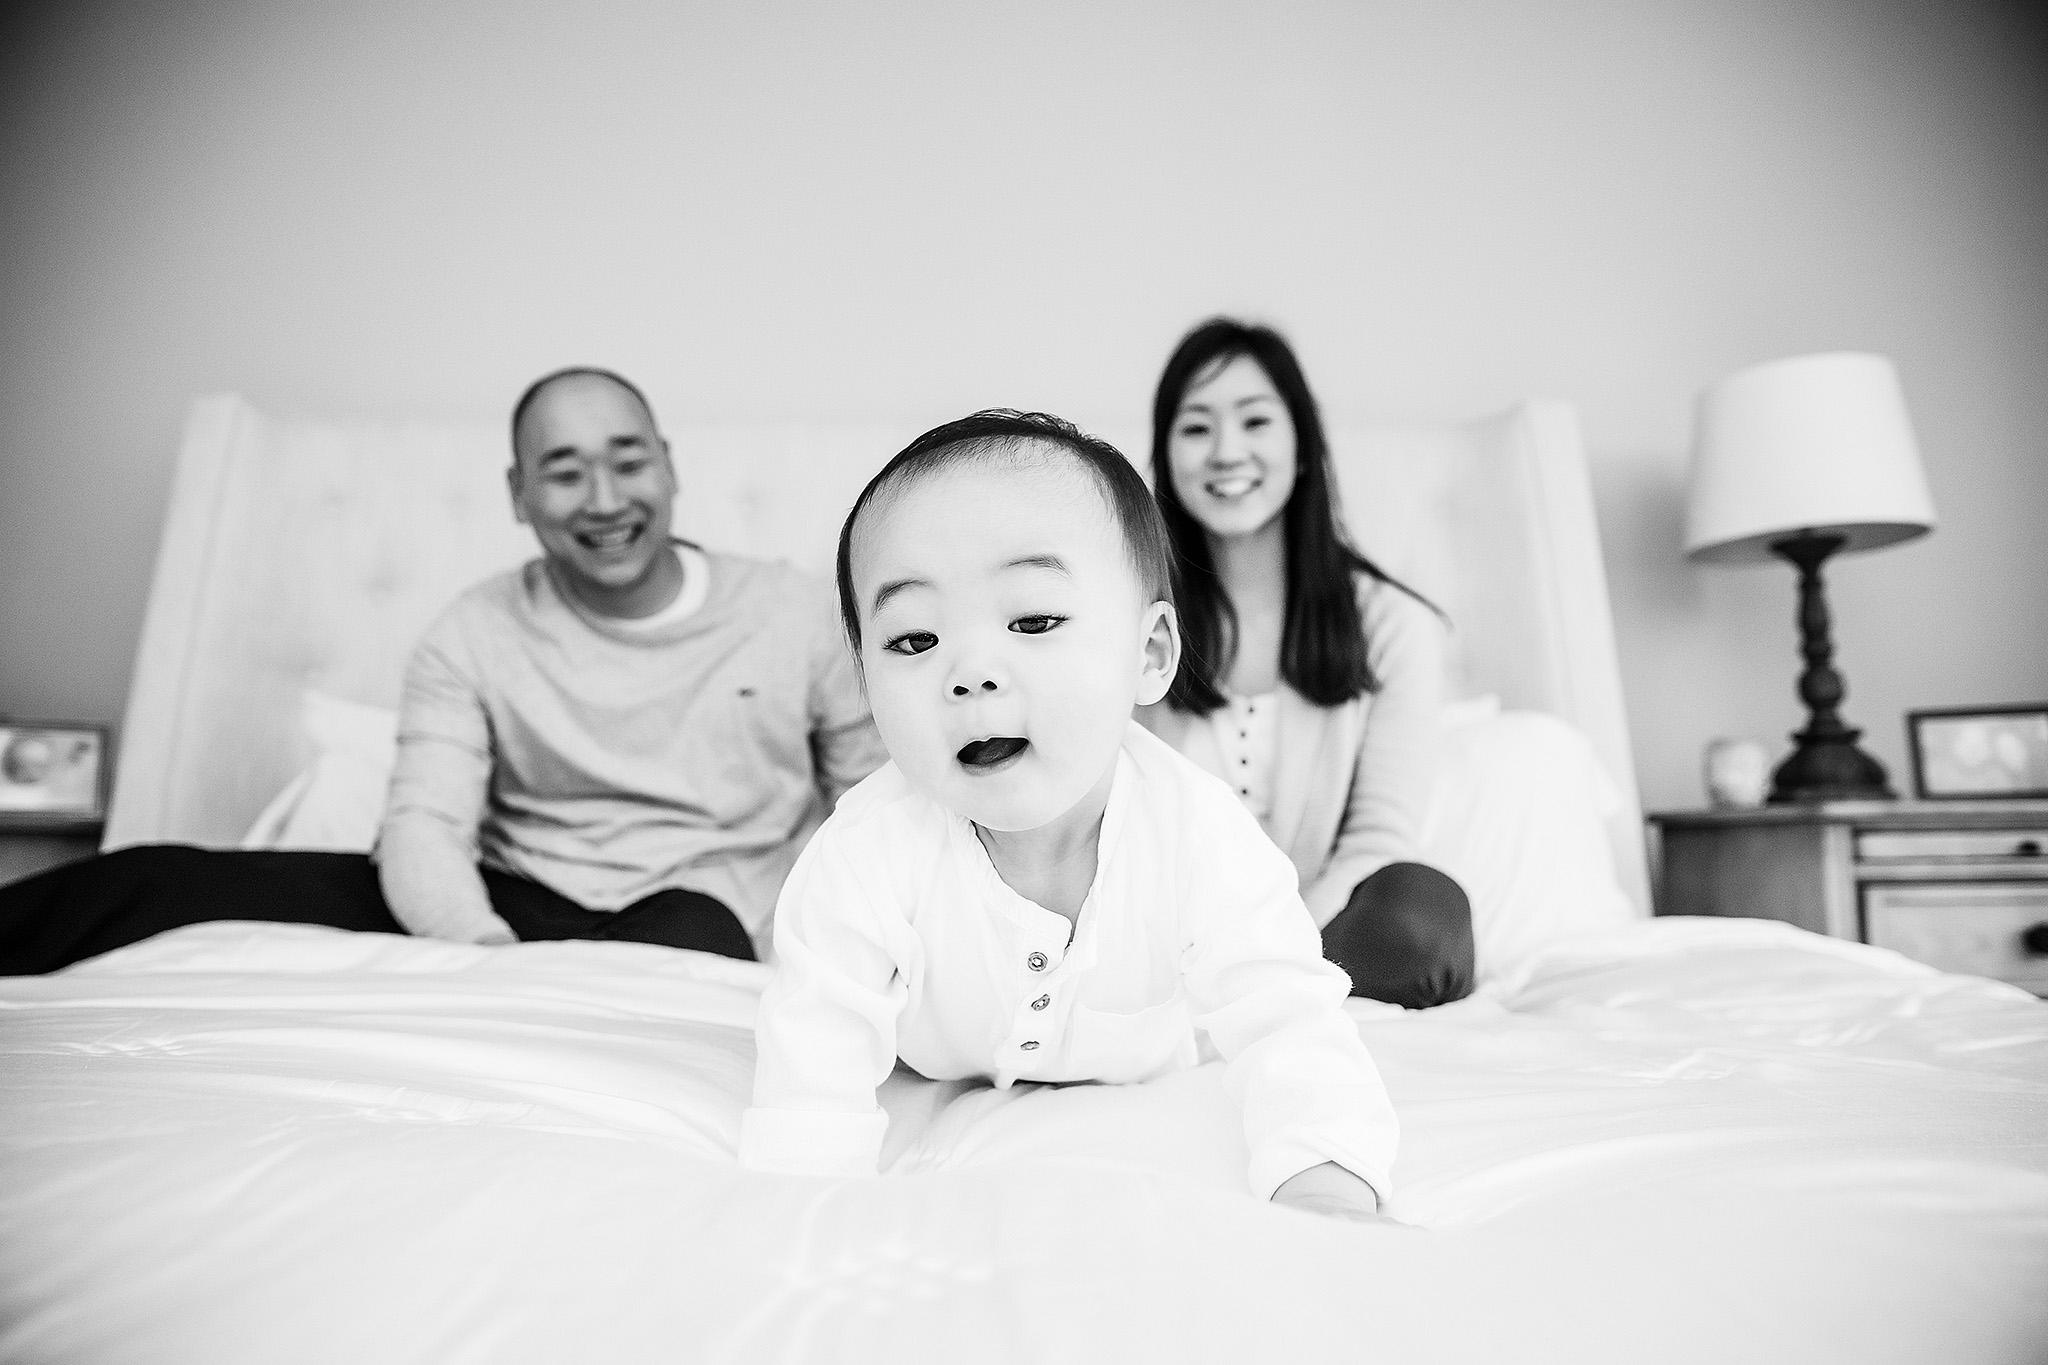 milwaukee baby milestone session 1